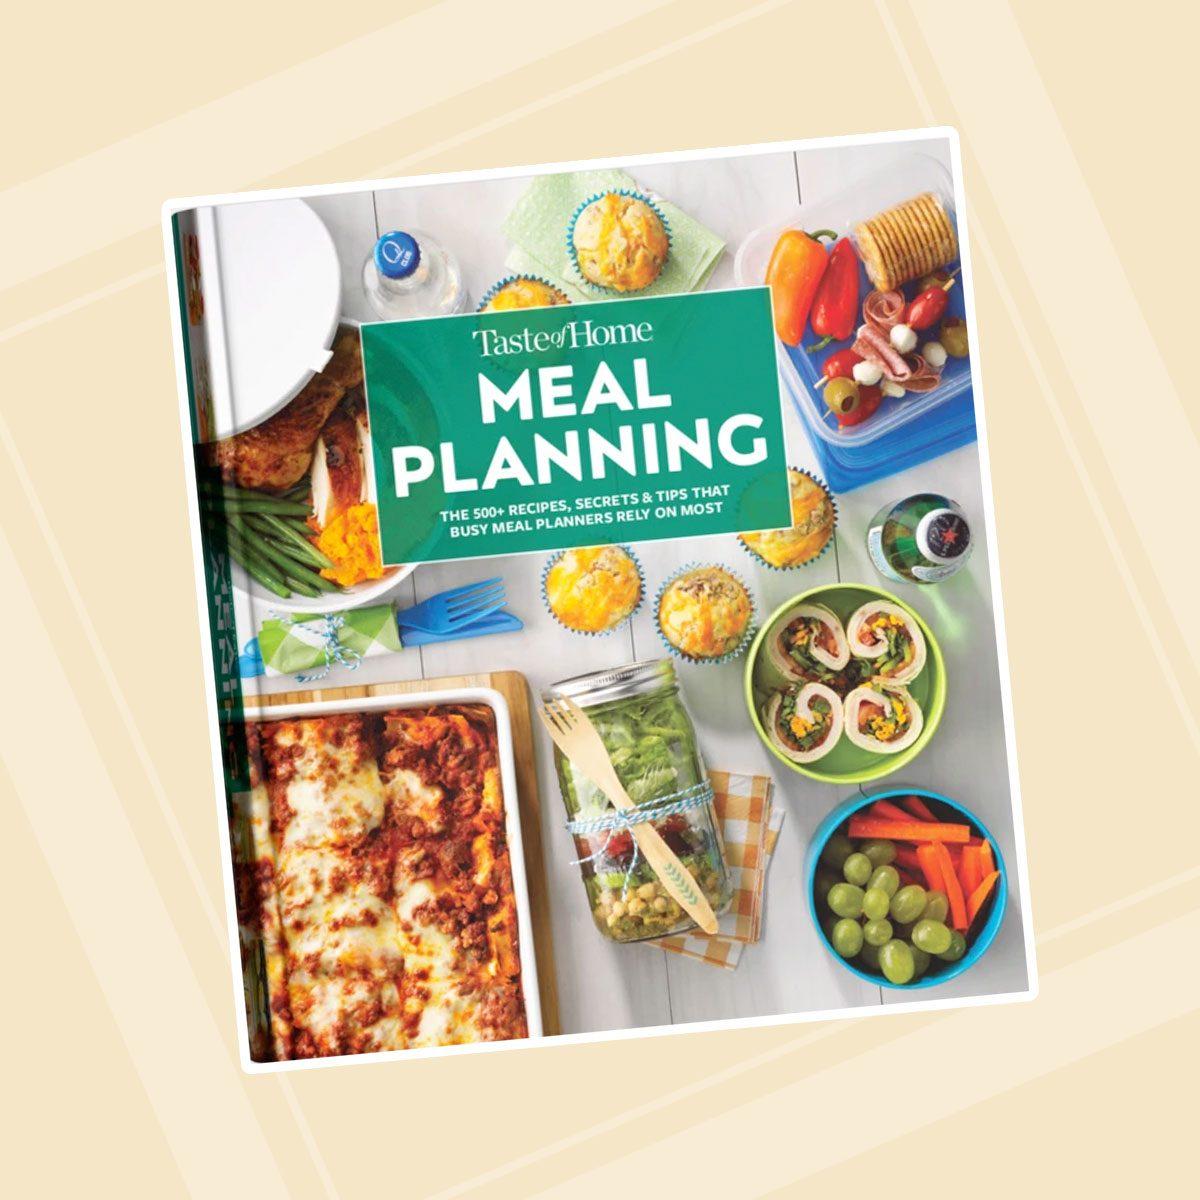 TASTE OF HOME Meal Planning